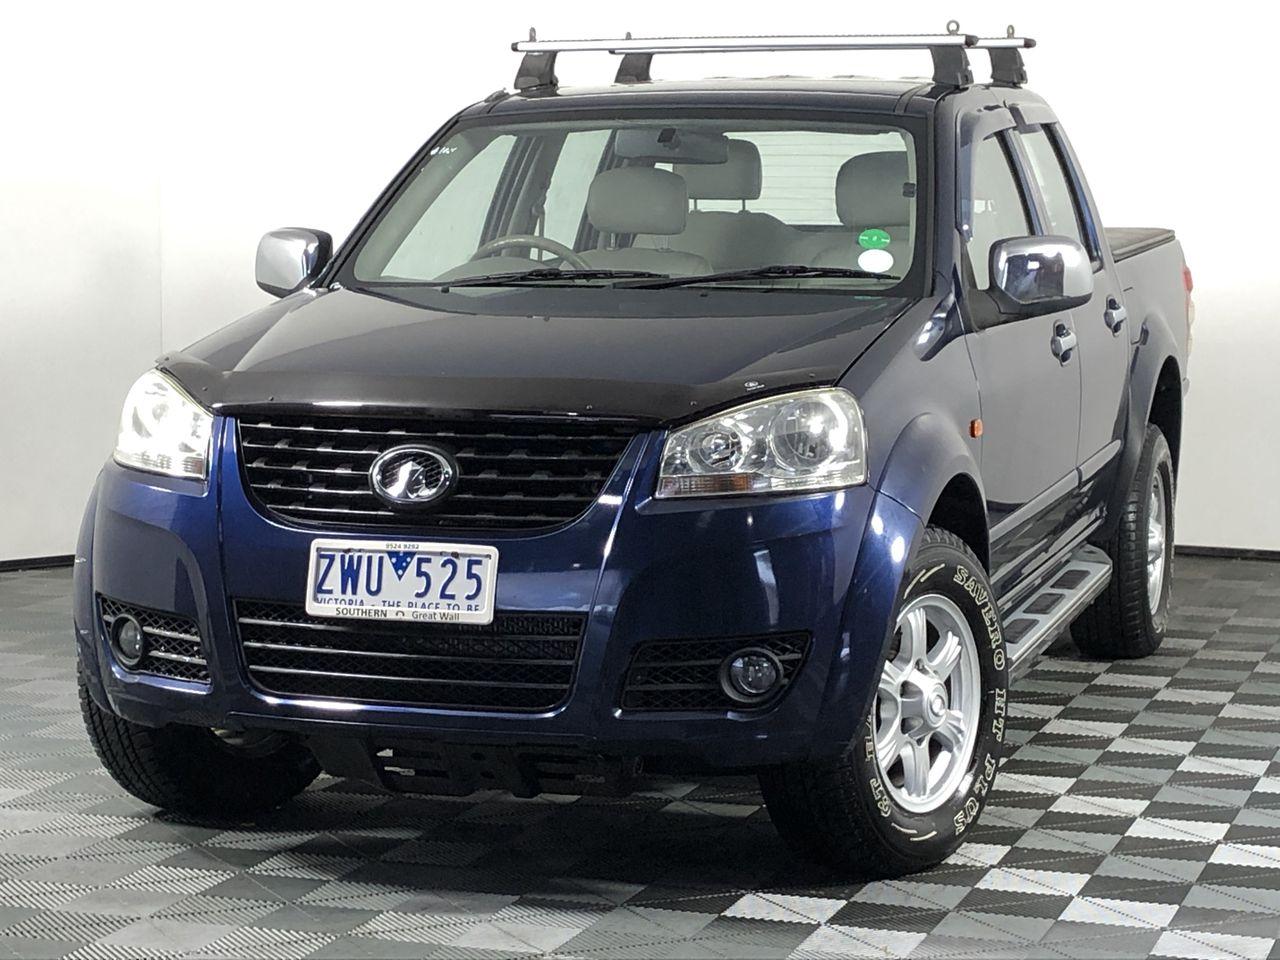 2012 Great Wall V200 4X4 Turbo Diesel Manual Dual Cab